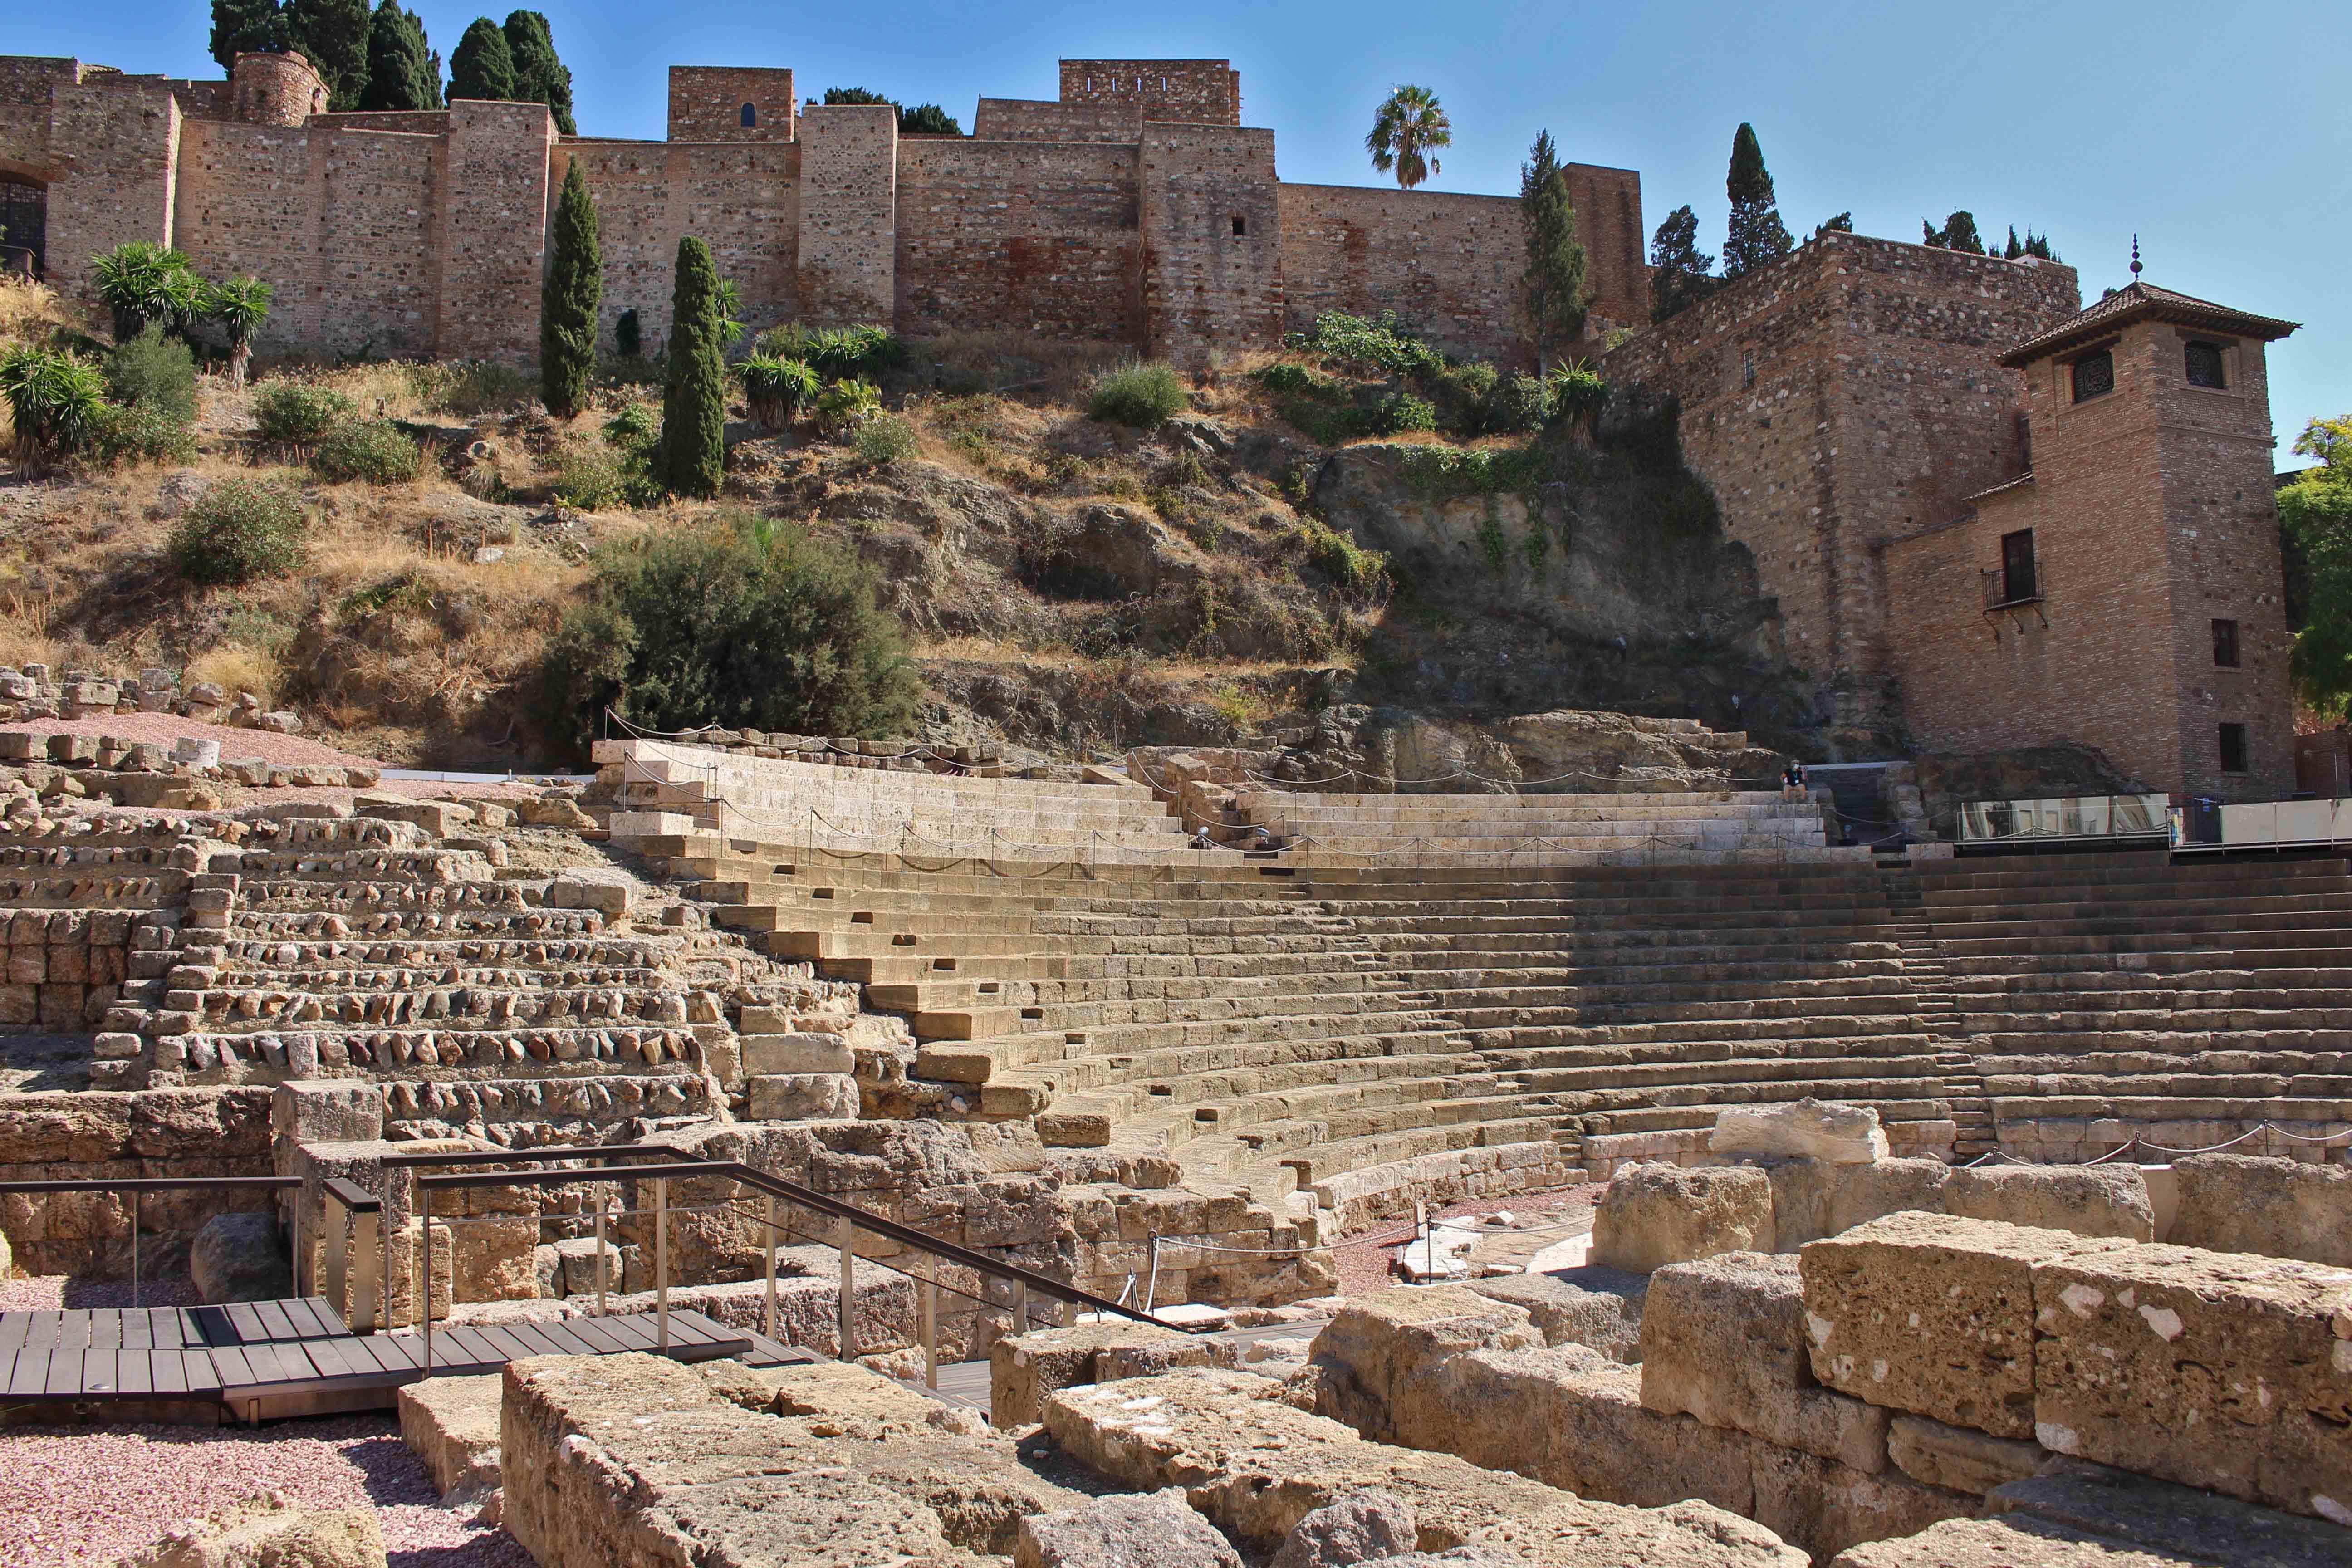 Free-Tour-historic-centre-of-Malaga-at-sunset-1